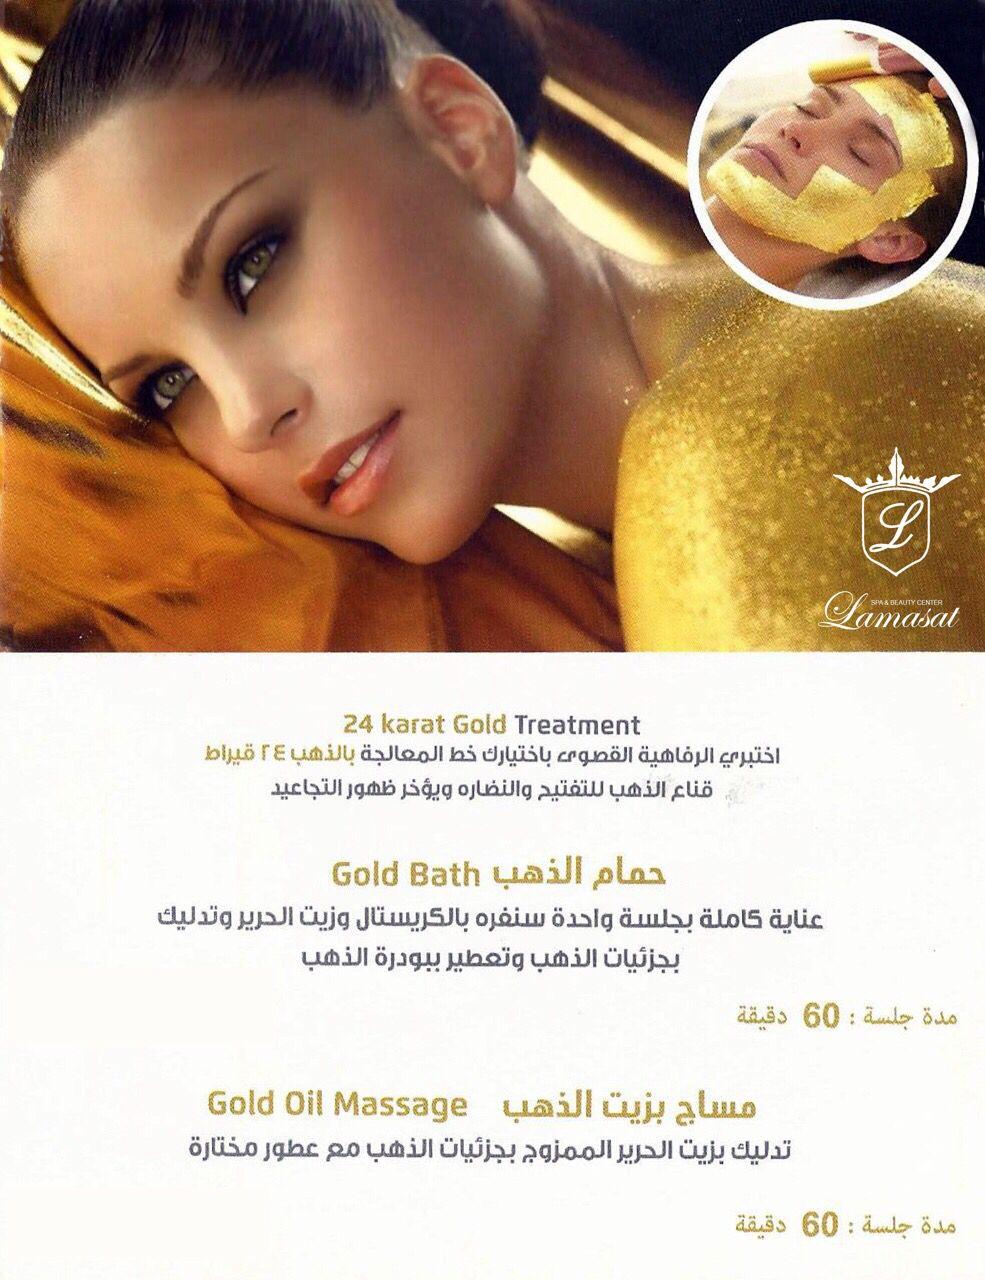 Spa Lamasat لمسات بيوتي سنتر جمالك لمسات تساريح مكياج Makeup Hairstyling Eyemakeup Nice Instagram Fashion Perfection Brid Massage Treatment Oils